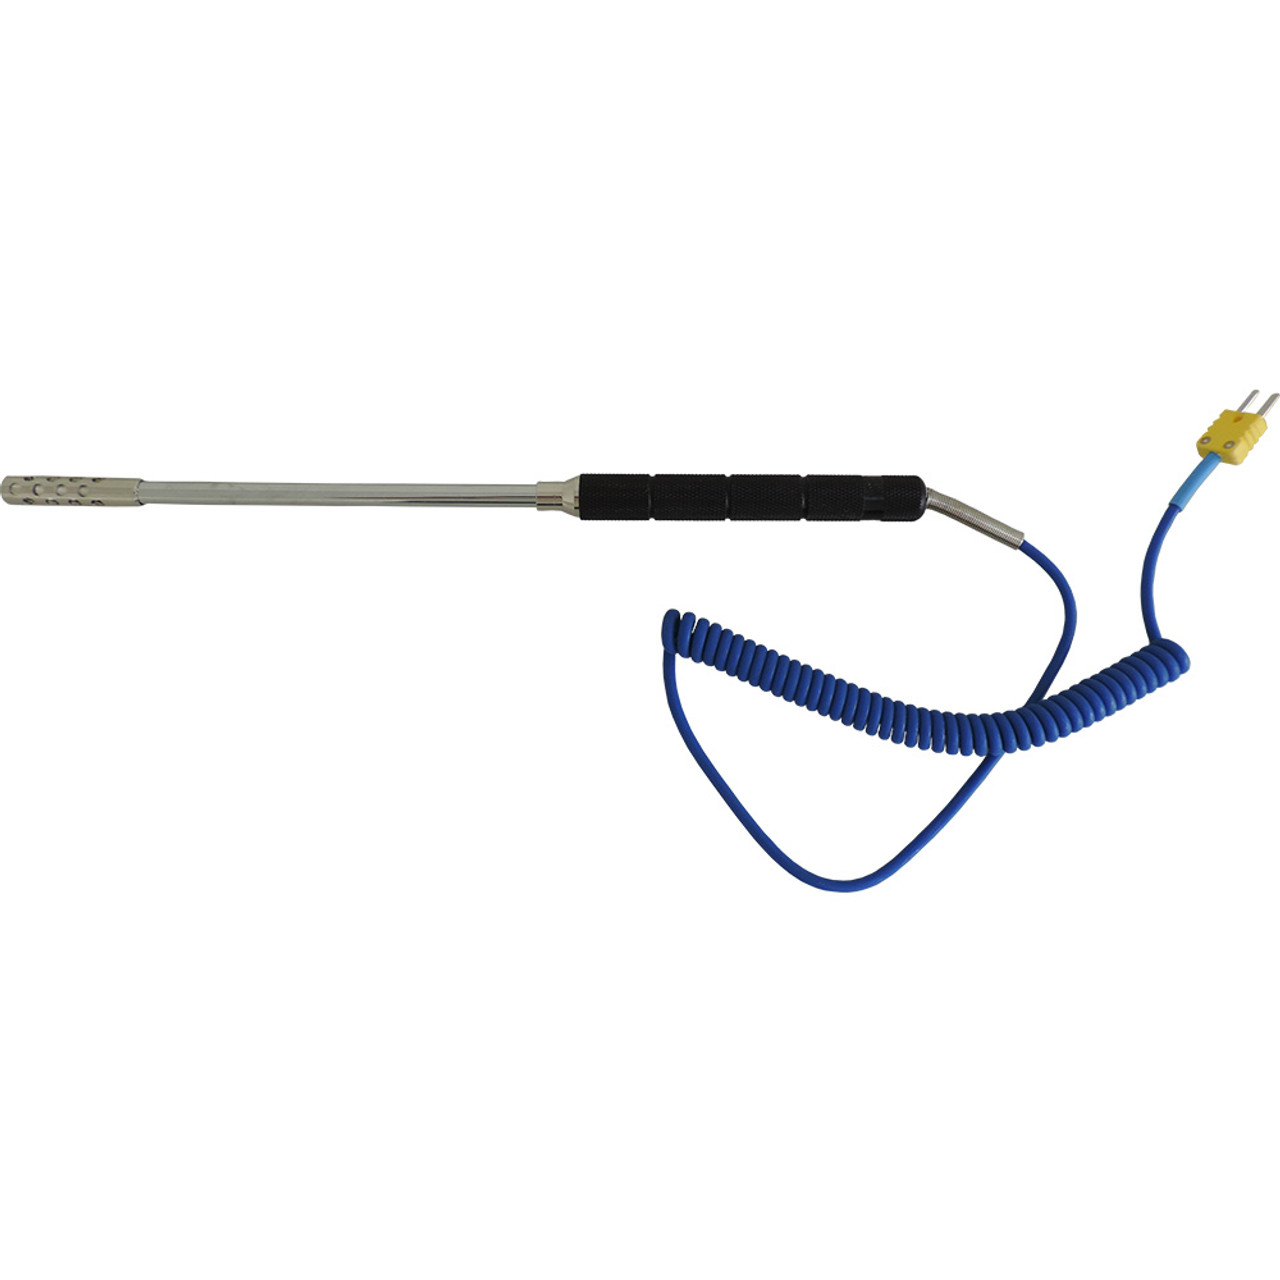 PSP-50AR Temperature Probe - External Air